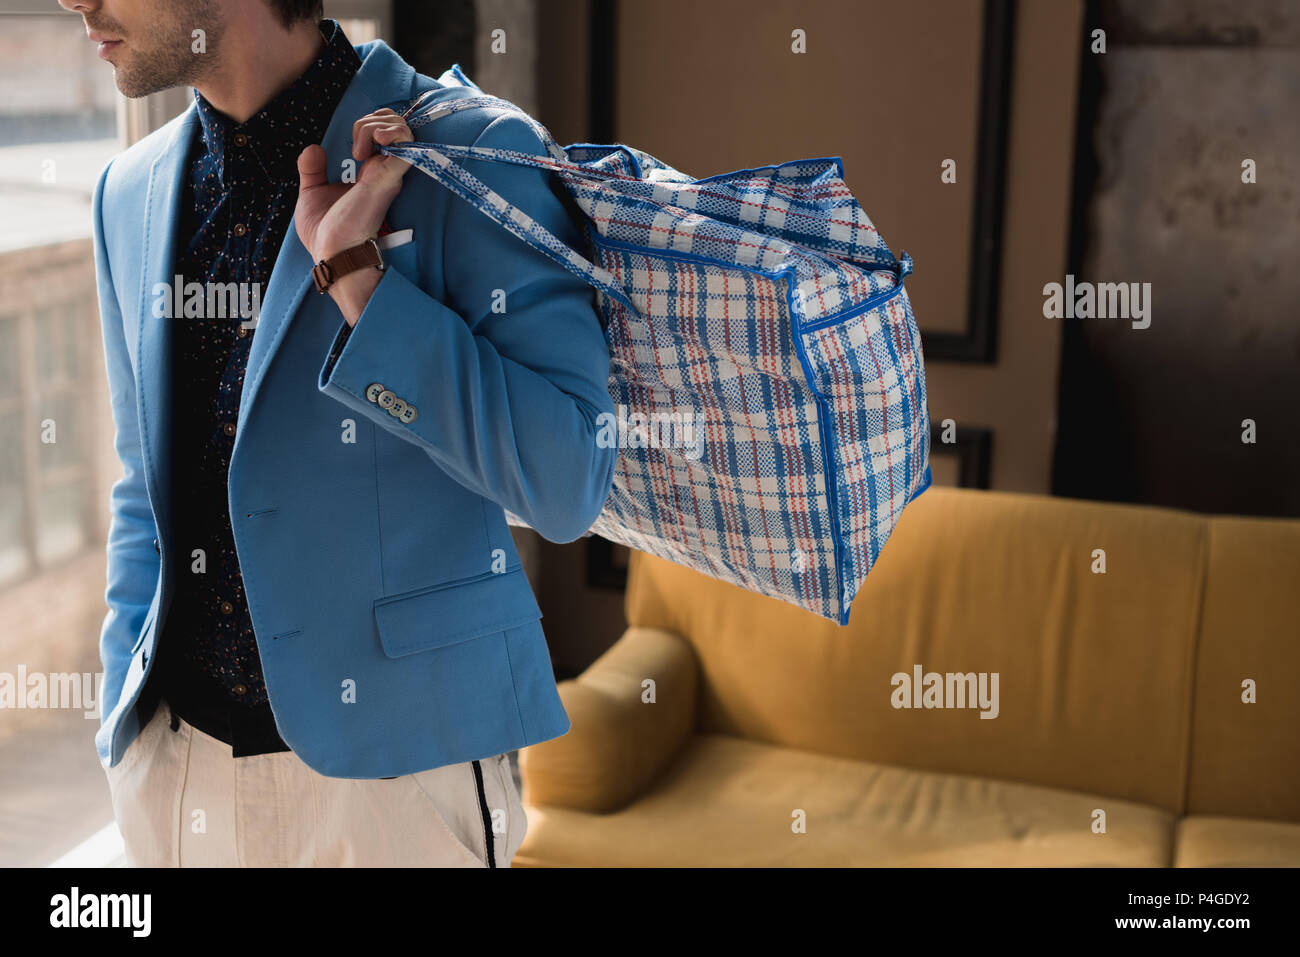 Captura recortada de joven con vintage bolsón con cremallera Imagen De Stock